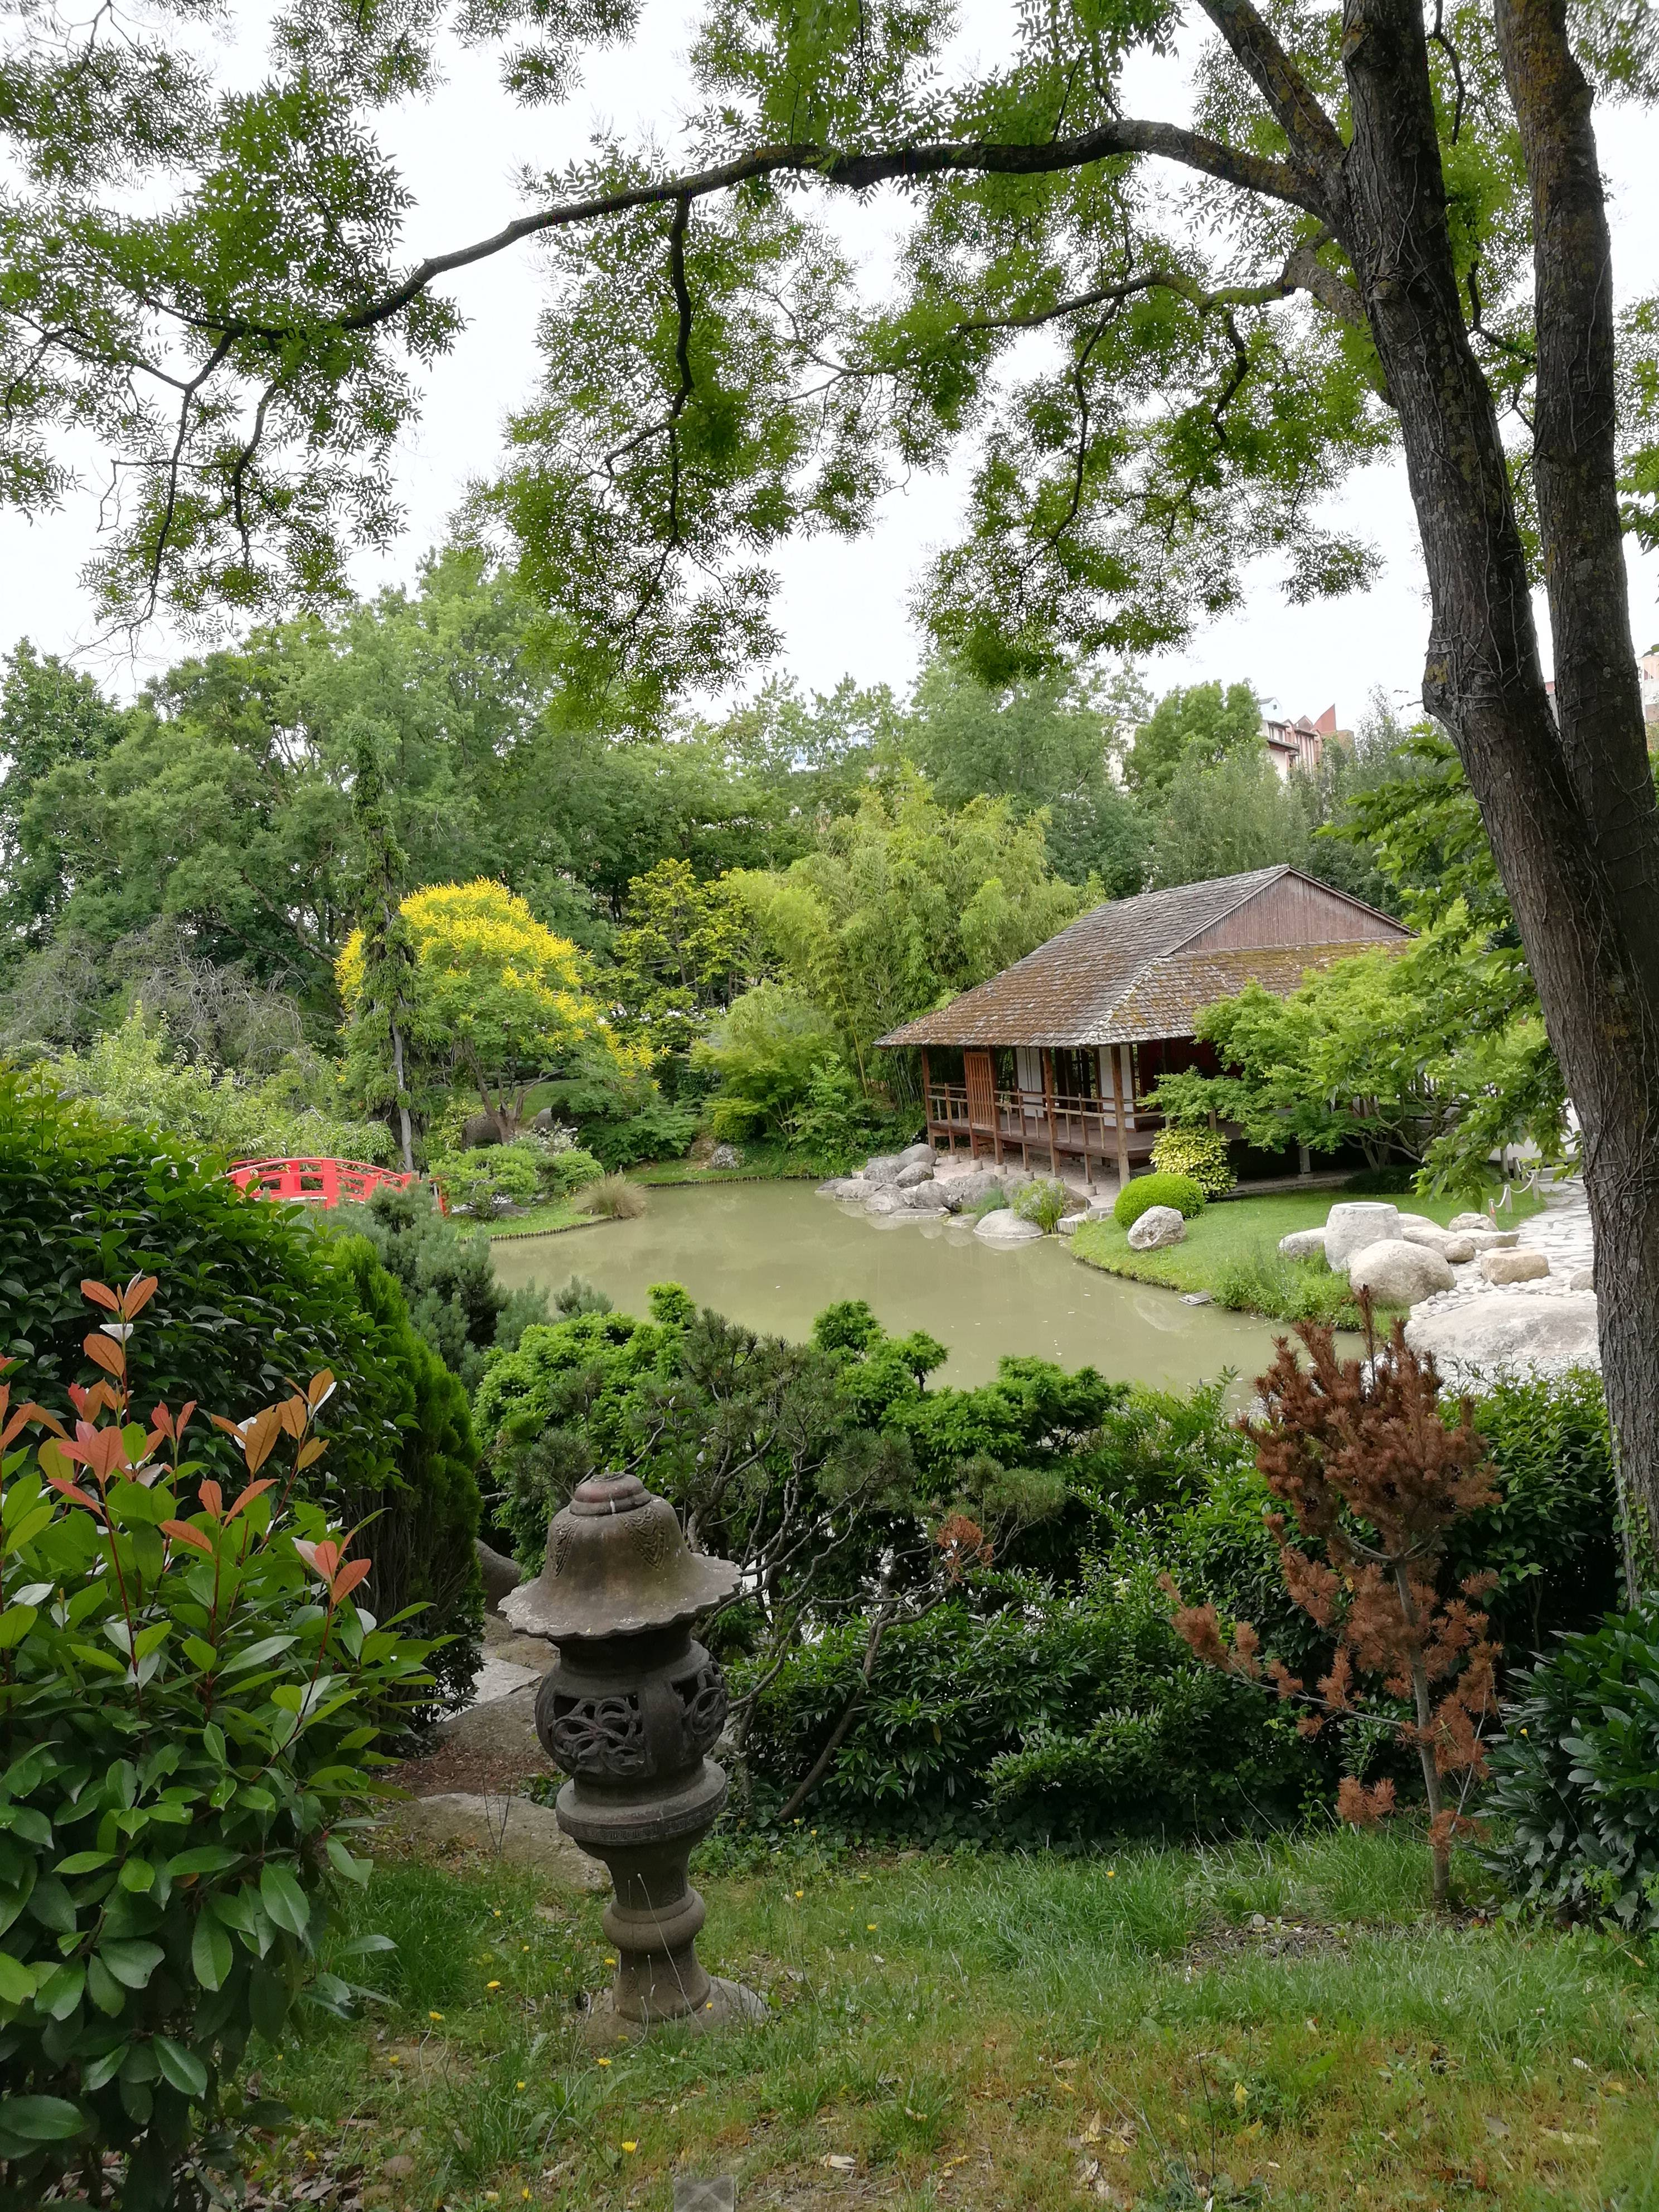 Photo 1: Jardin Japonais